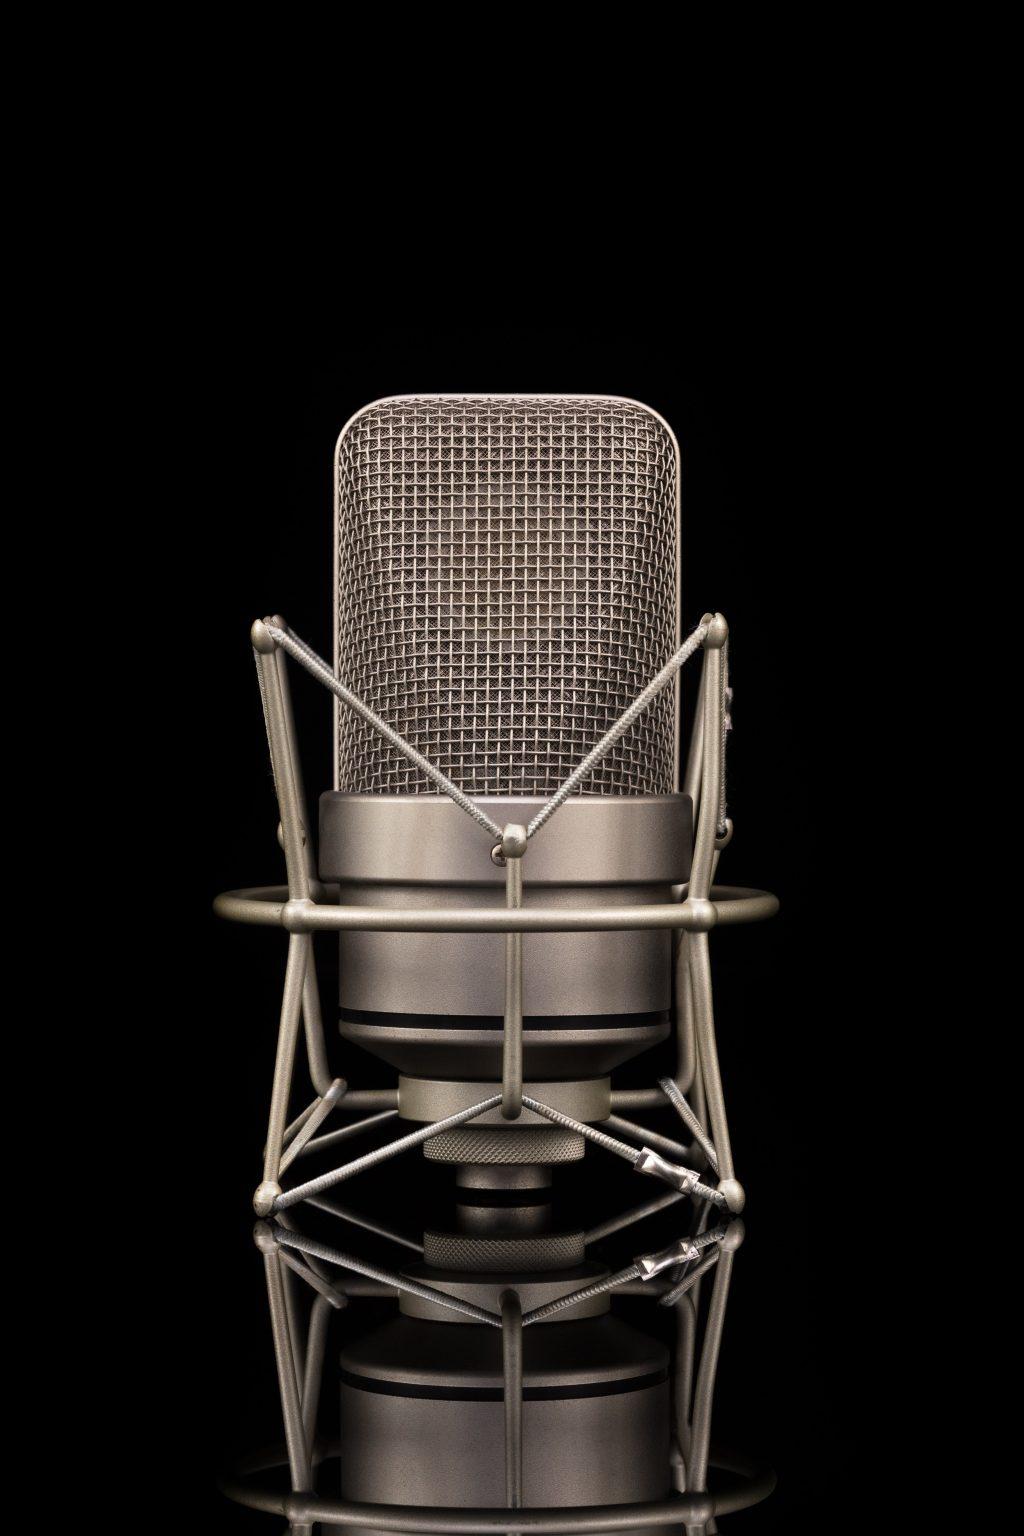 gray-condenser-microphone-3532003